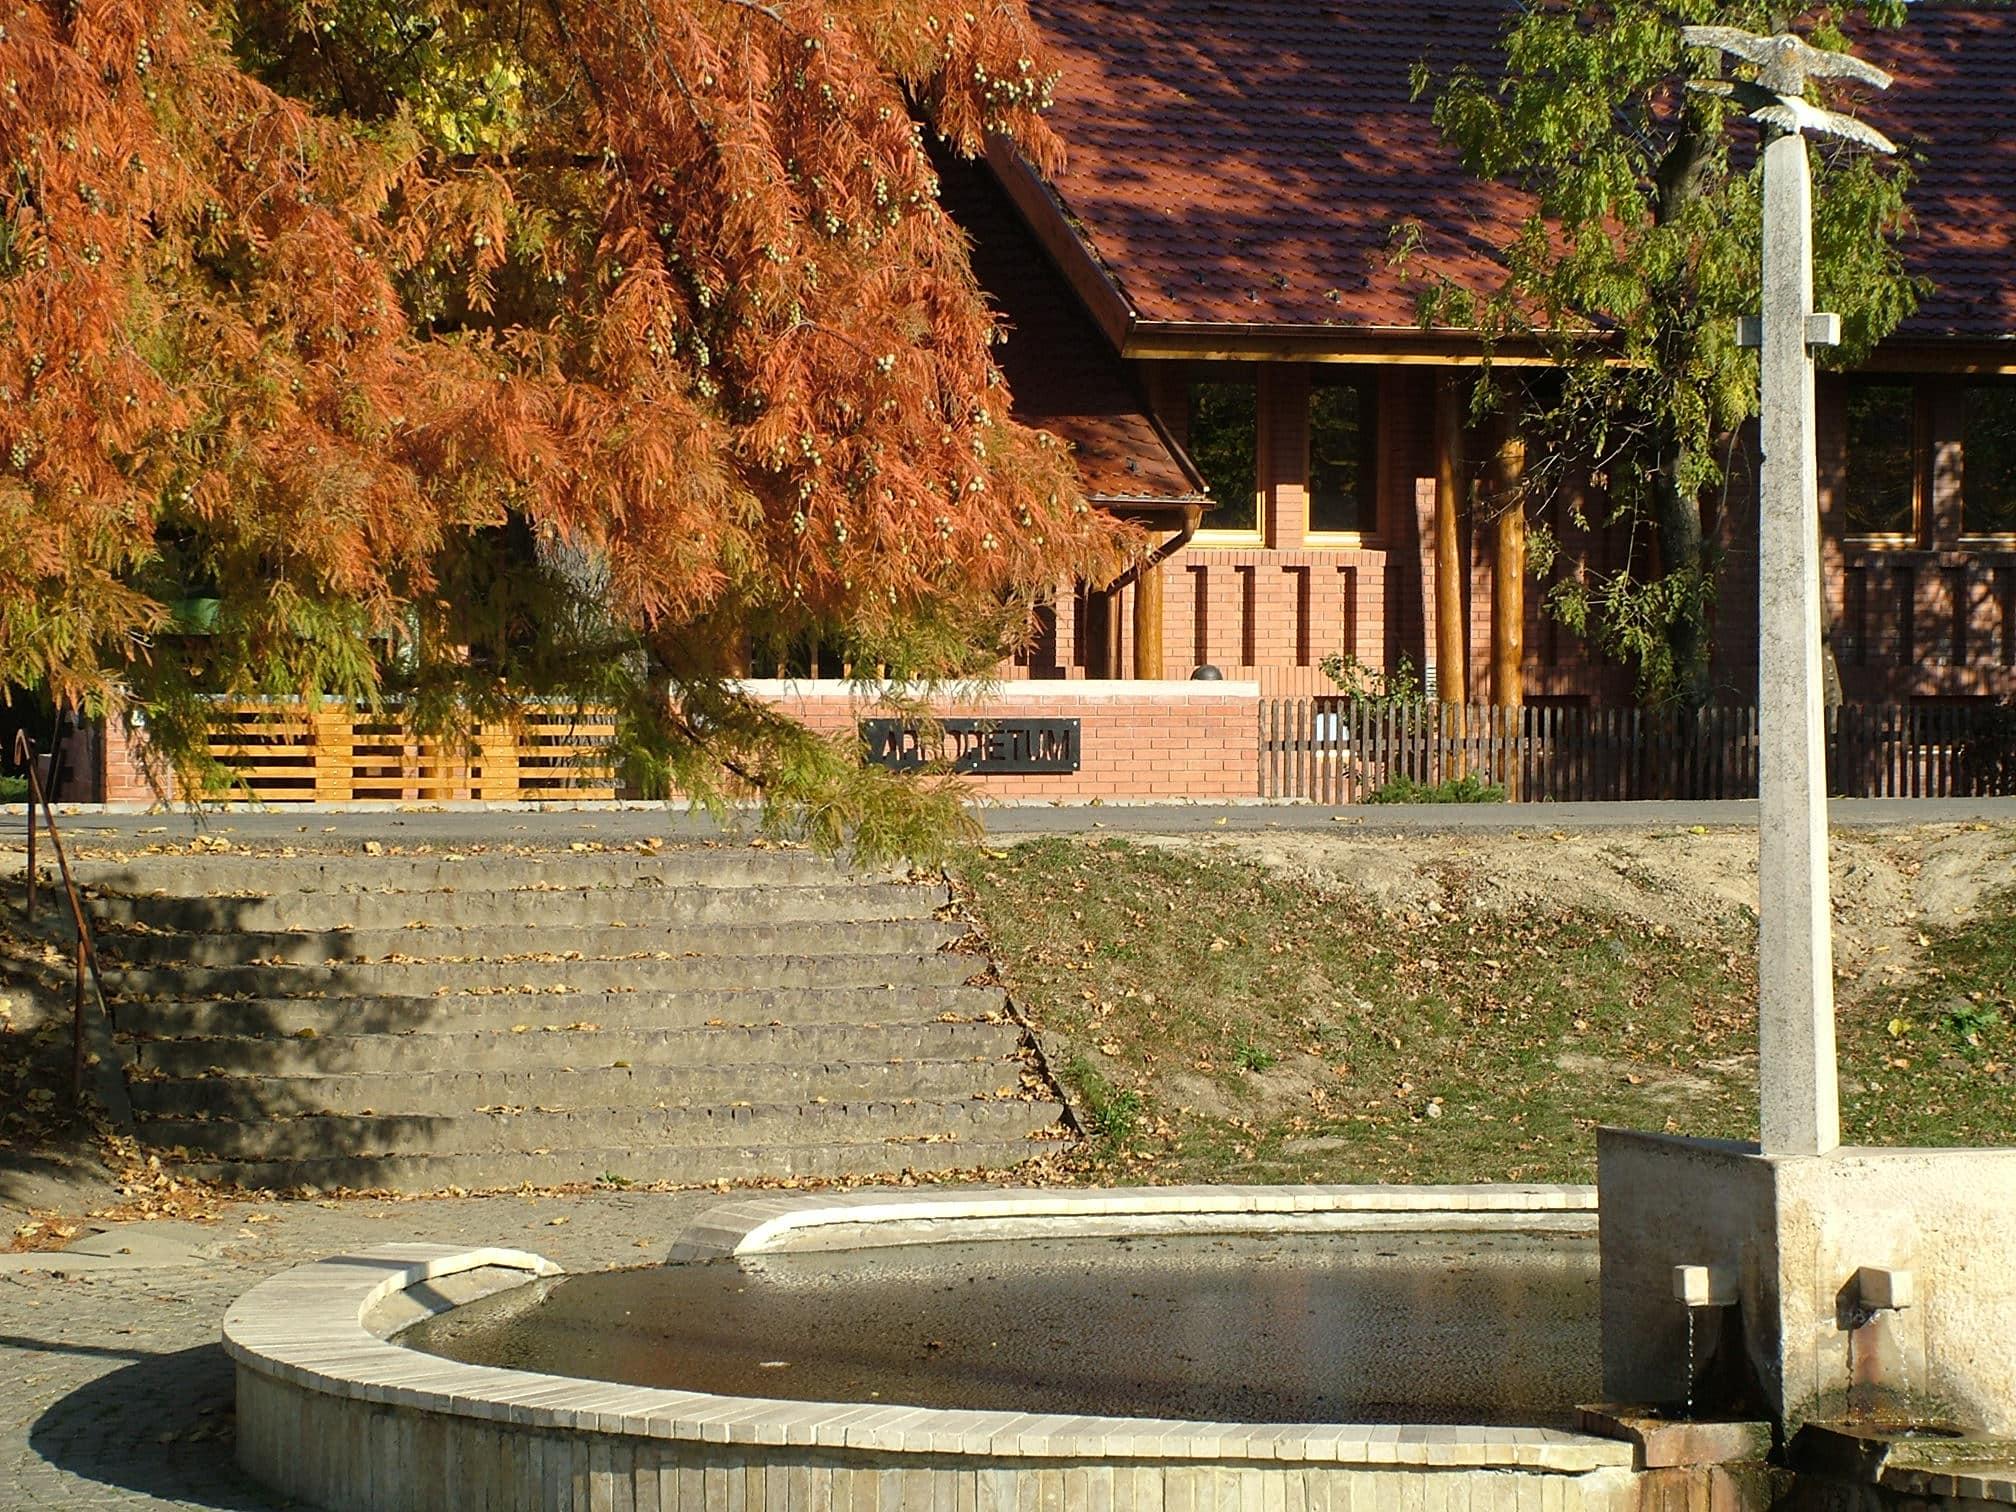 Tiszakürti Arborétum